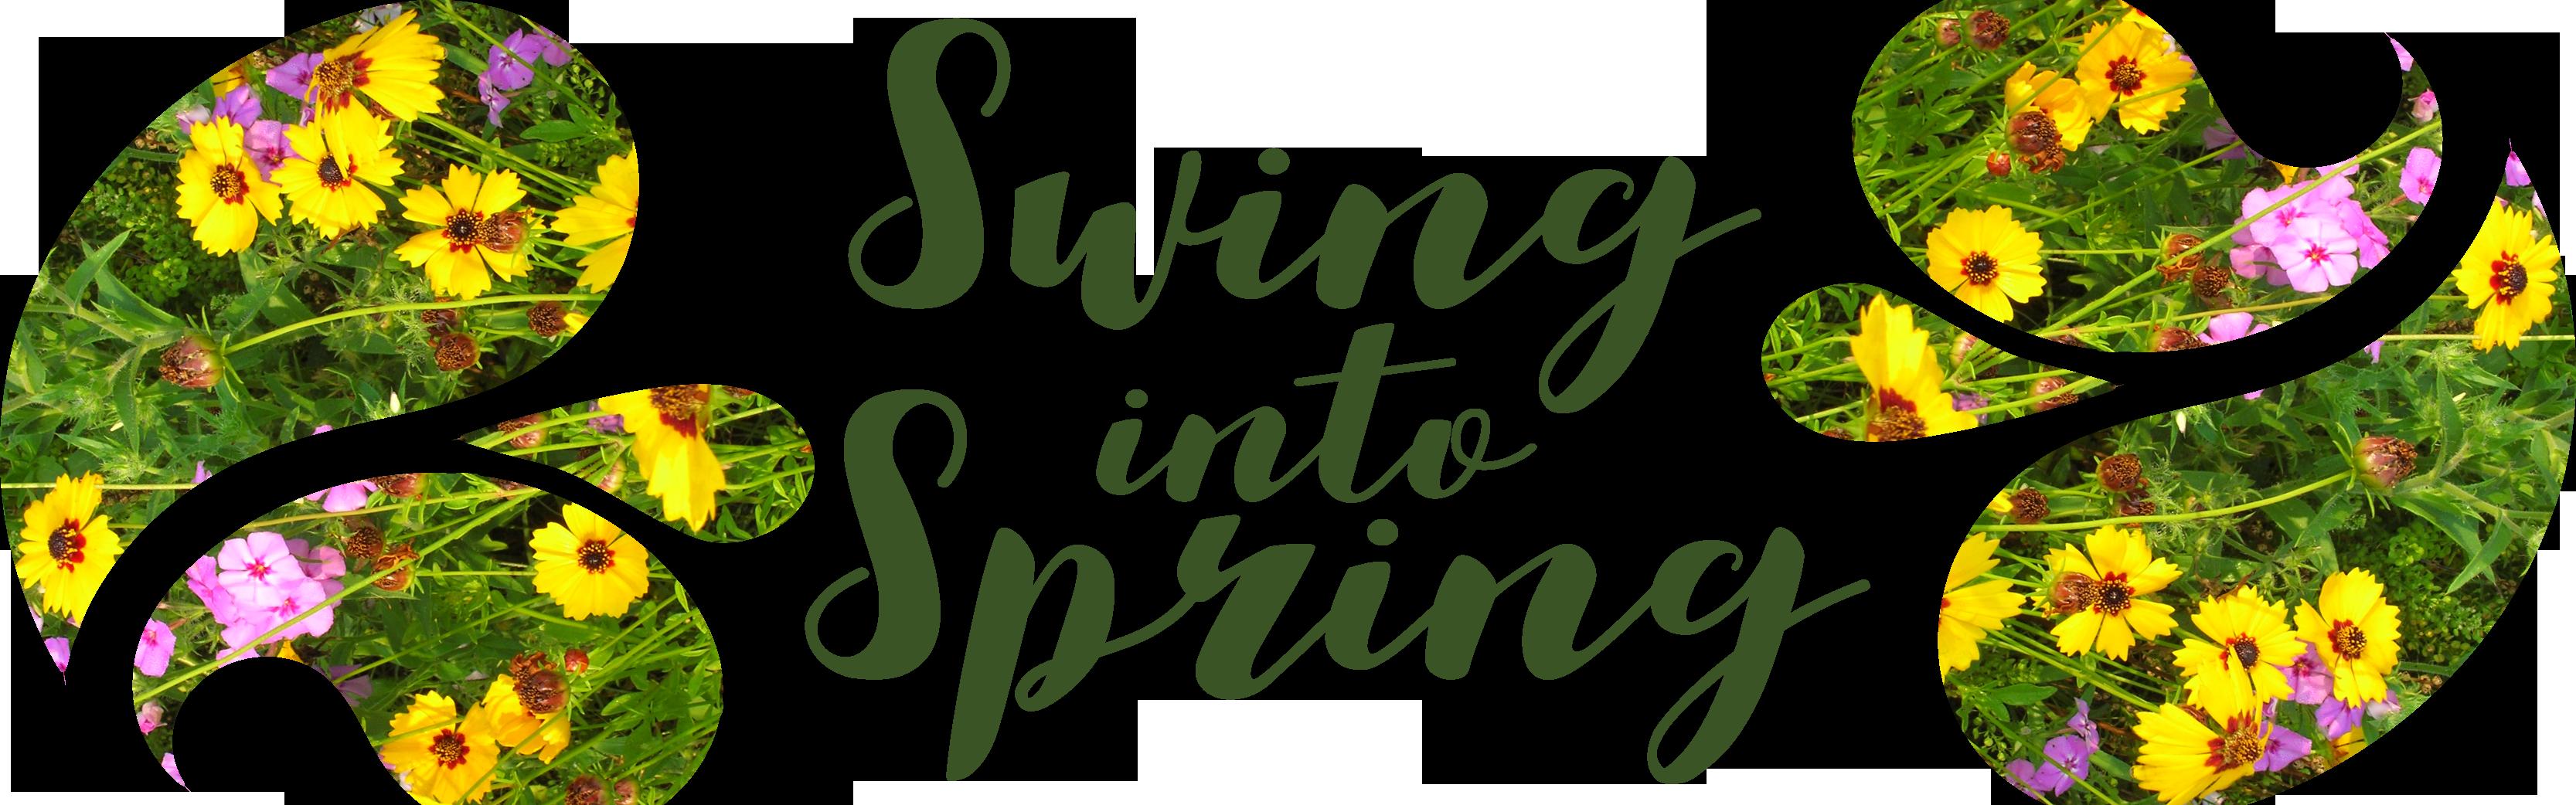 Facebook clipart header. Swing into spring paisley